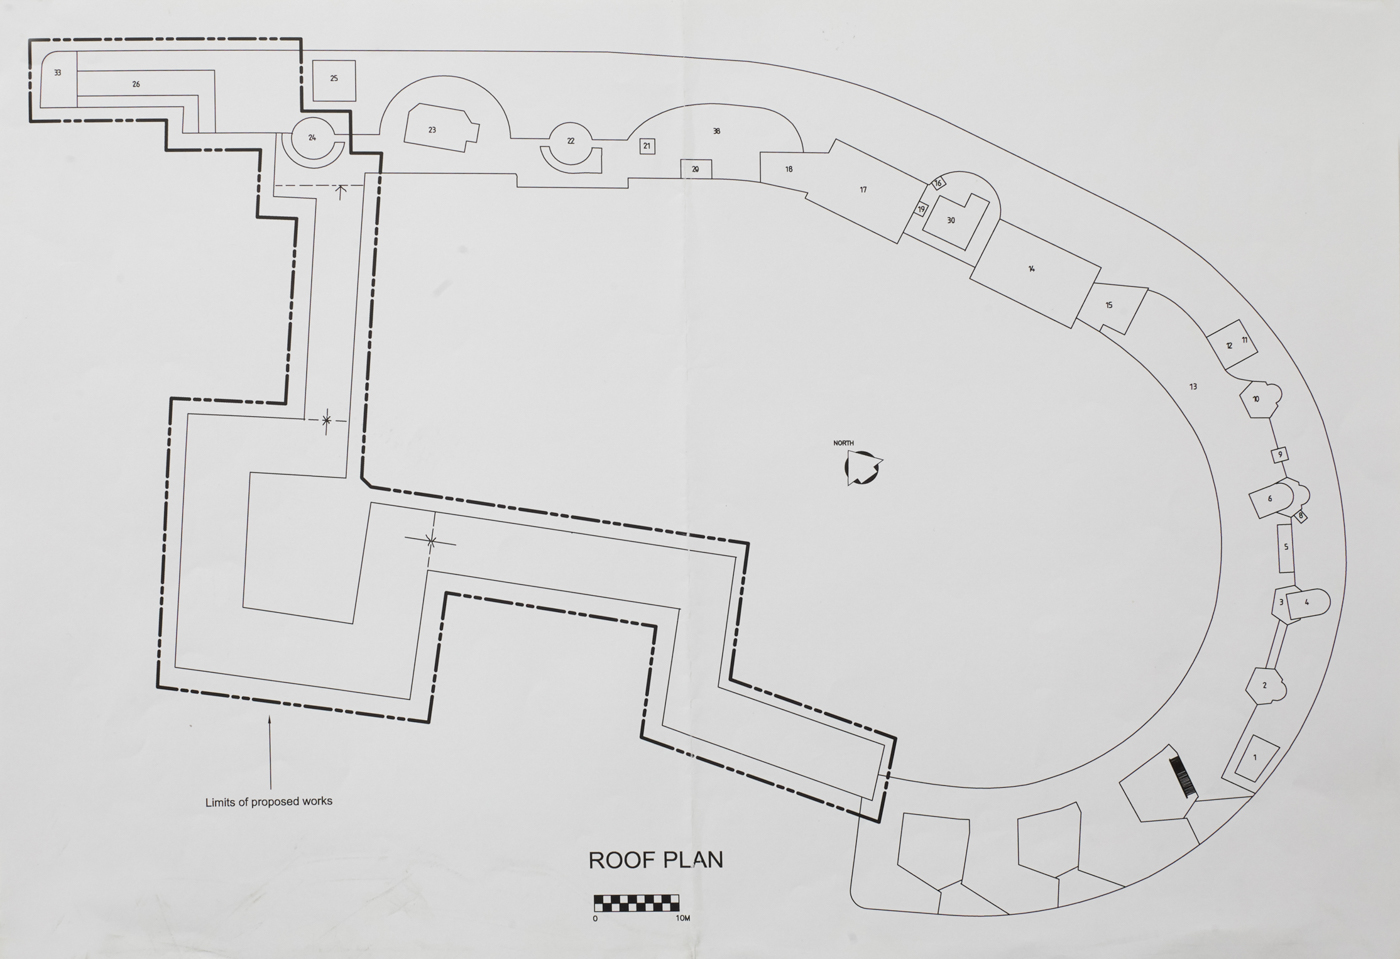 Plan_Roof.jpg